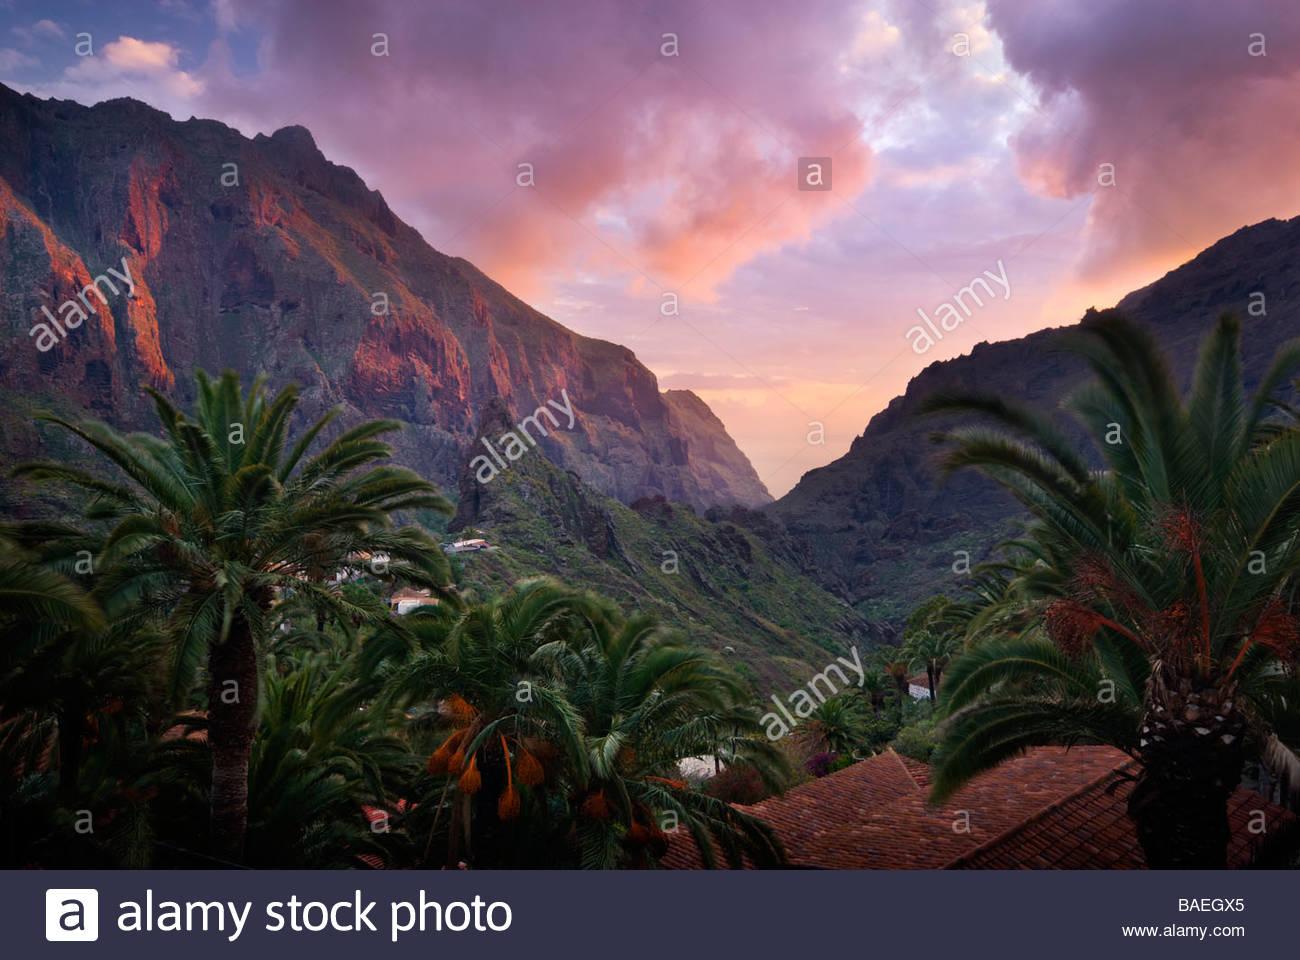 Le village de Masca, Tenerife, Canaries, Espagne. Photo Stock